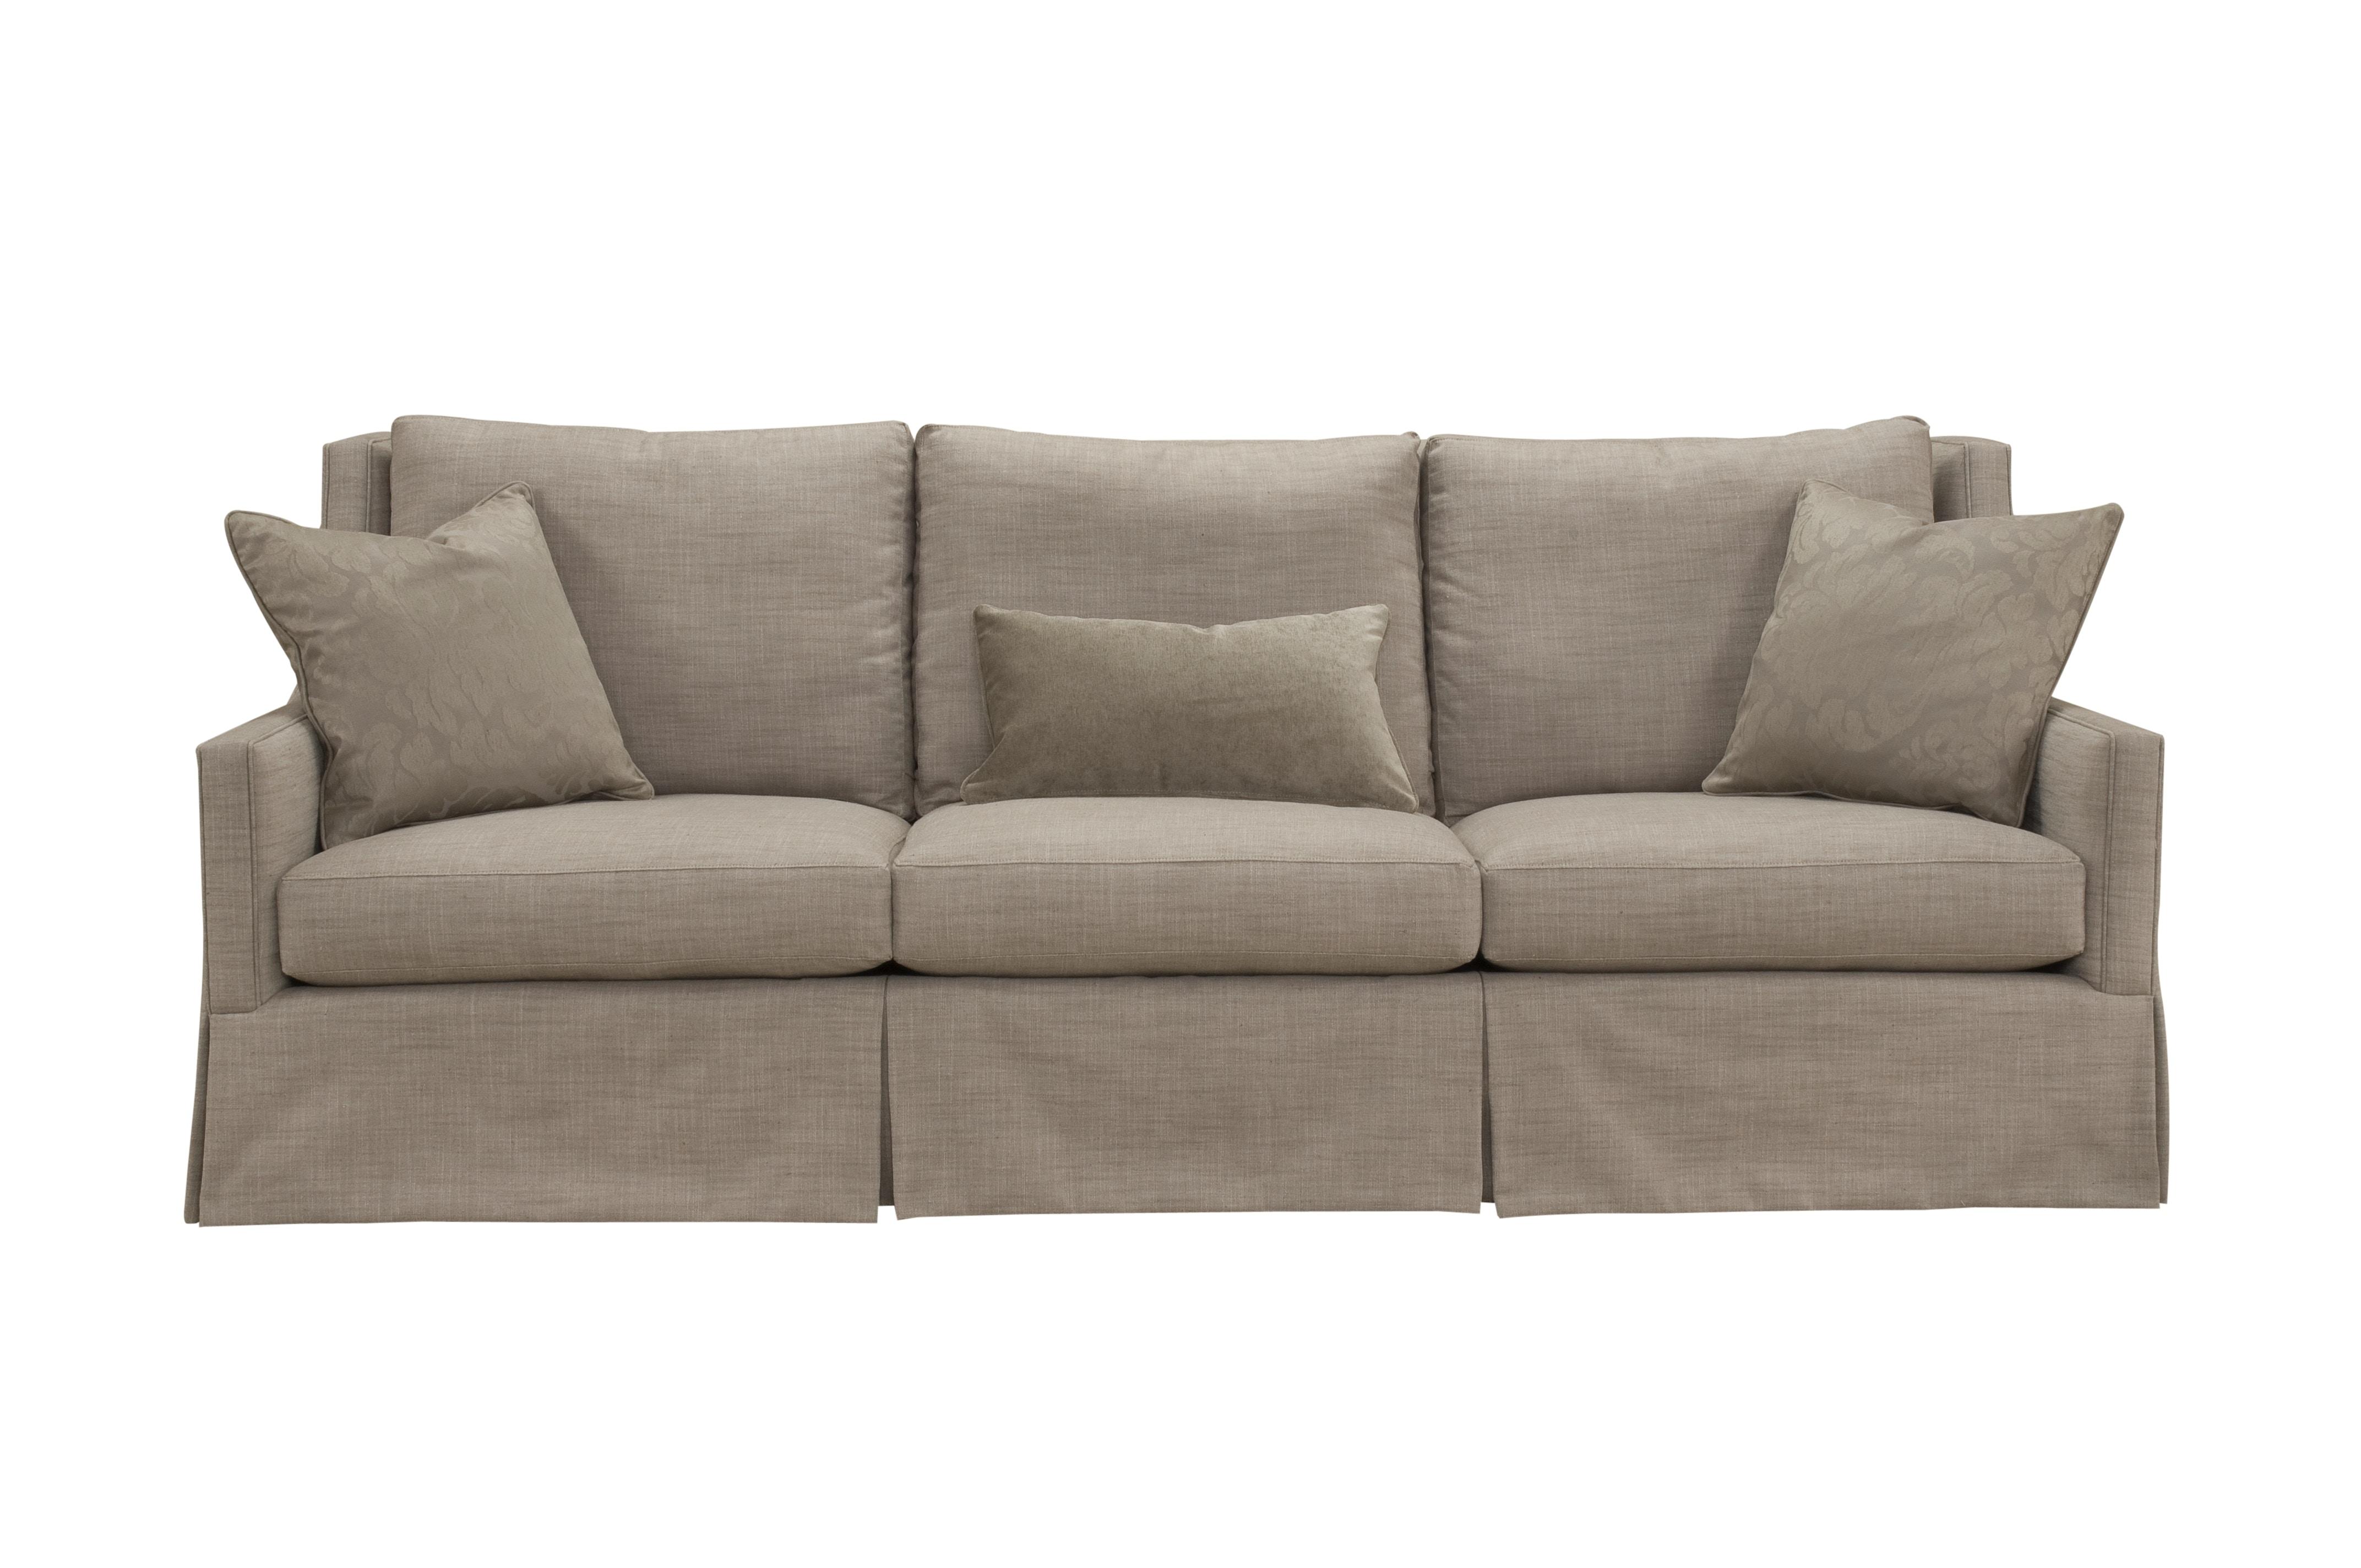 southern furniture hudson sofa mayfair dark grey sectional living room 25221 | hickory ...